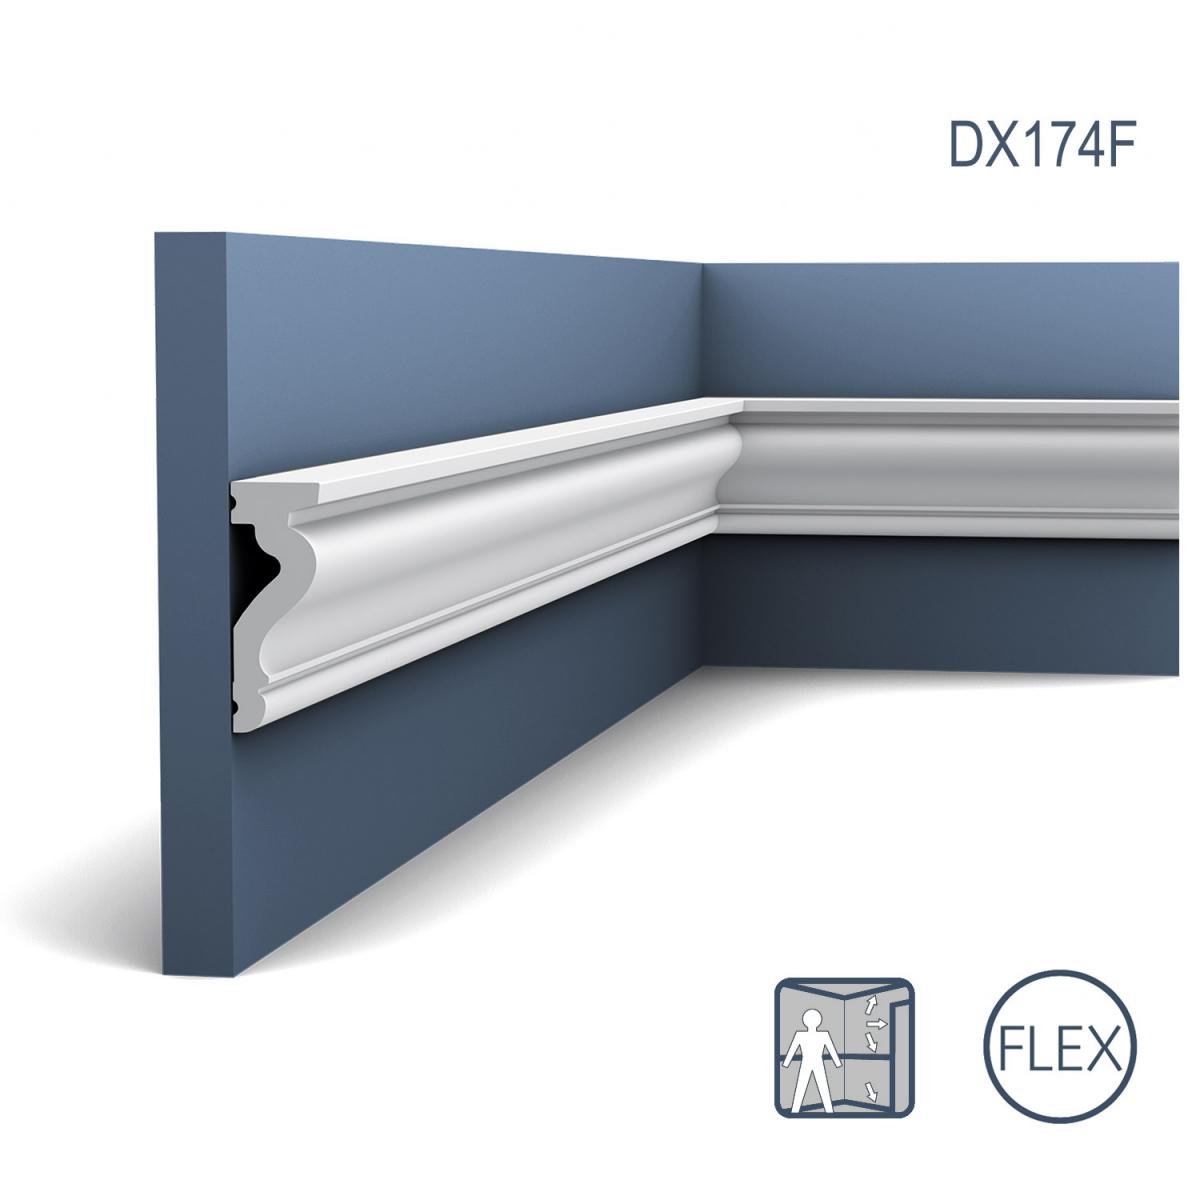 Ancadrament Usa Luxxus Flex DX174F, Dimensiuni: 230 X 2.2 X 6 cm, Orac Decor